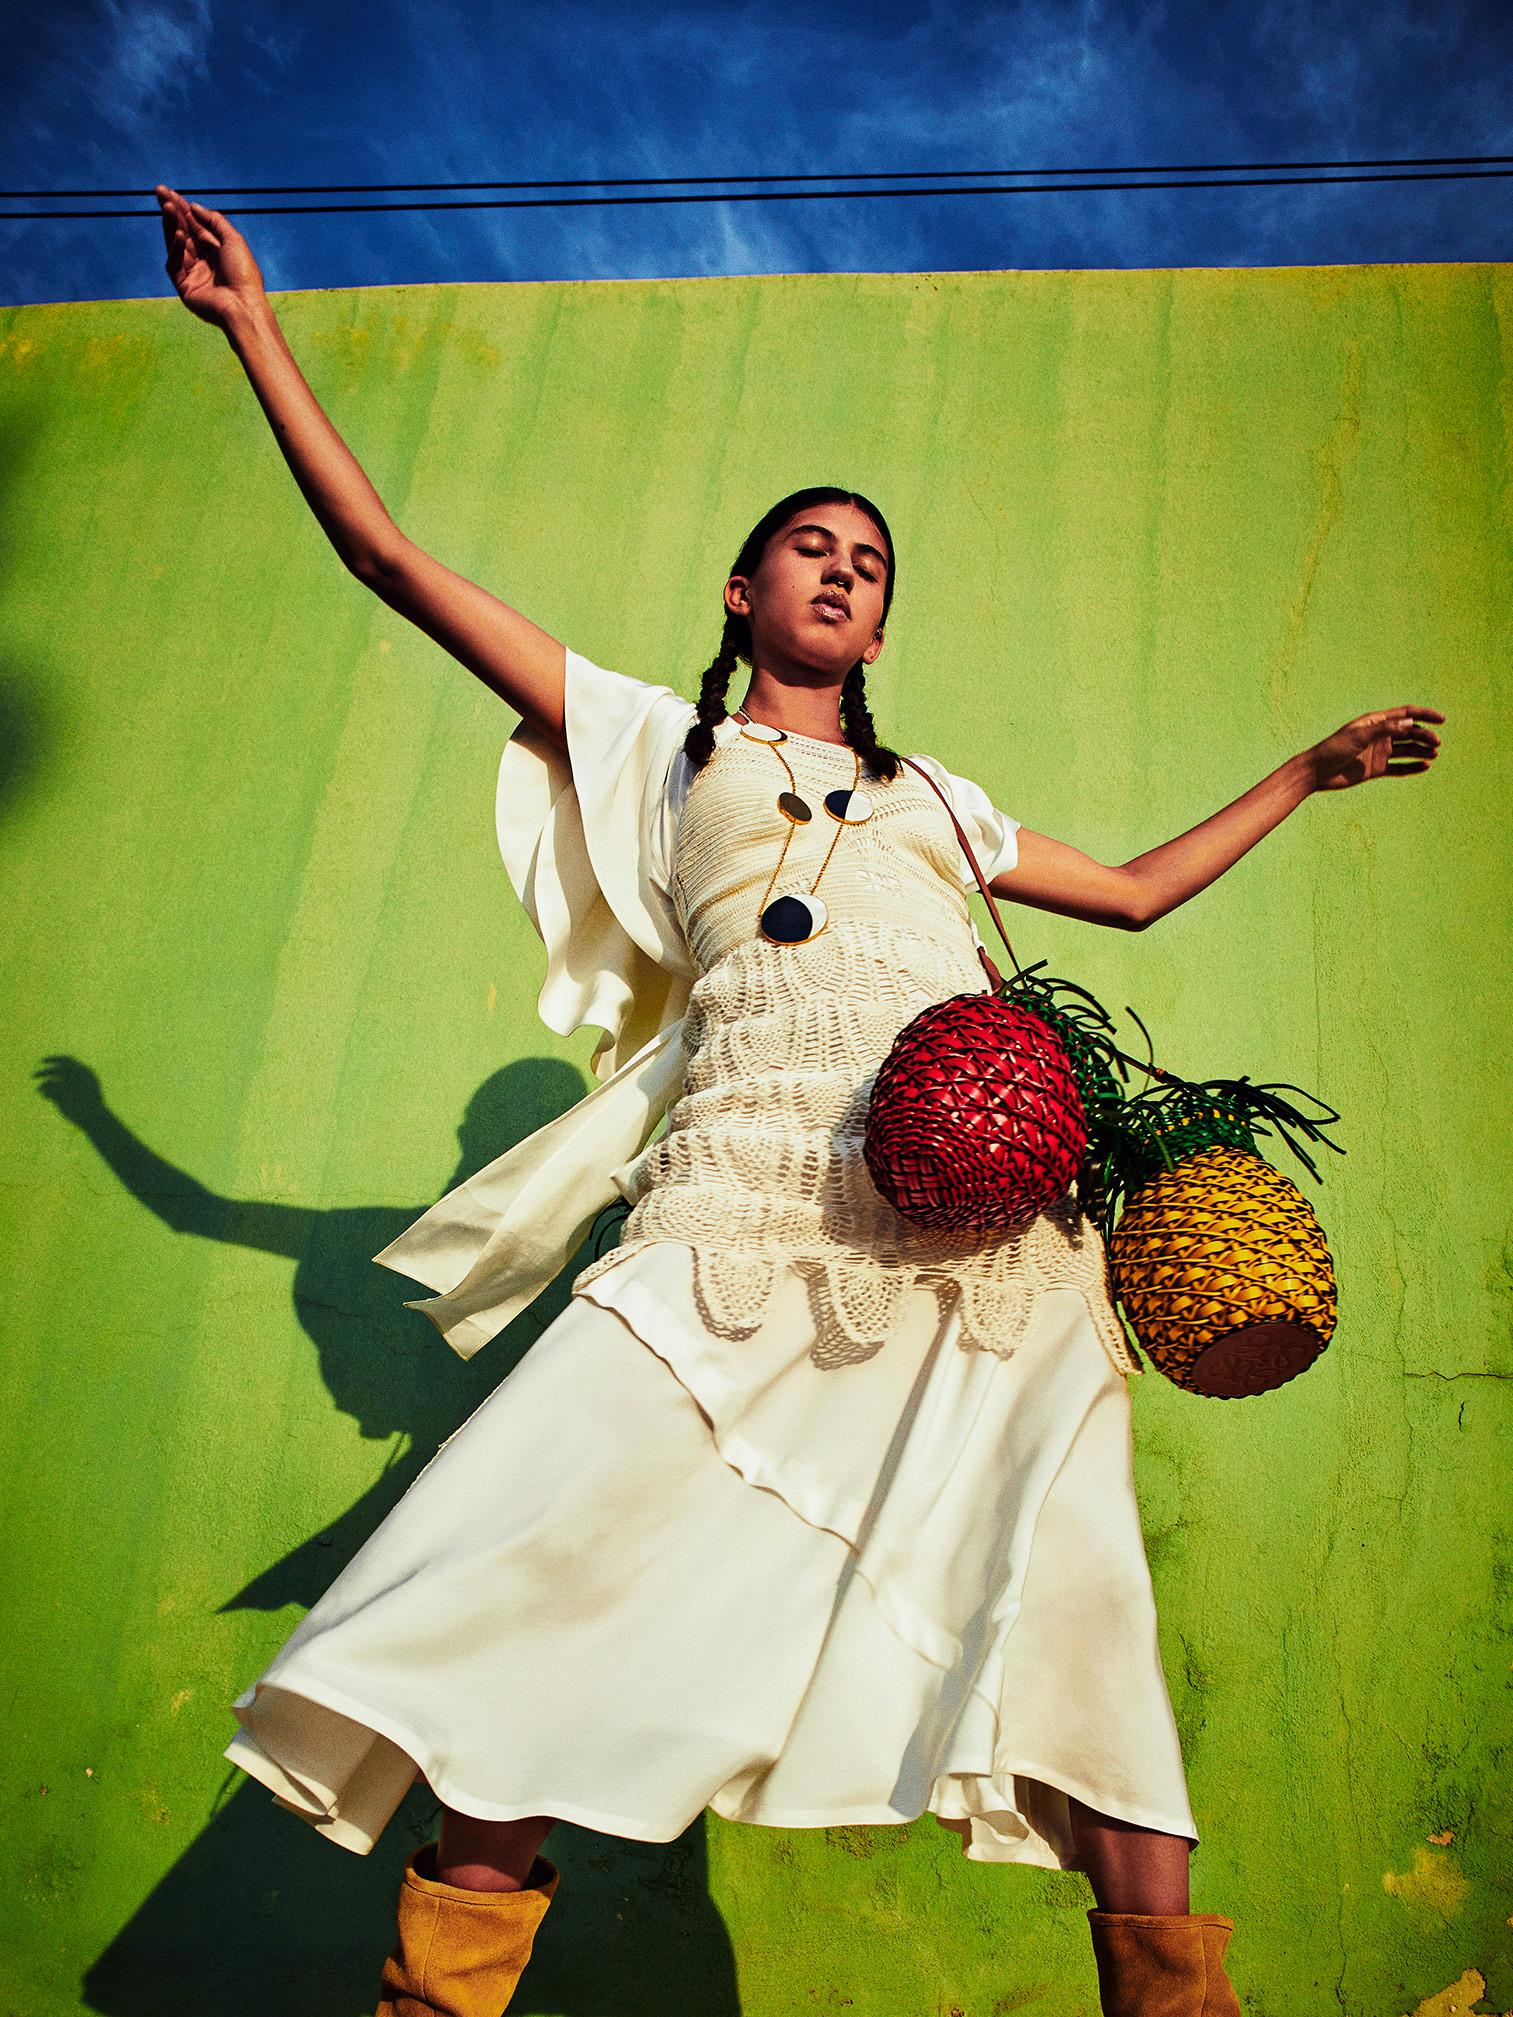 Loewe Paula's Ibiza Spring 2021 Ad Campaign Photos